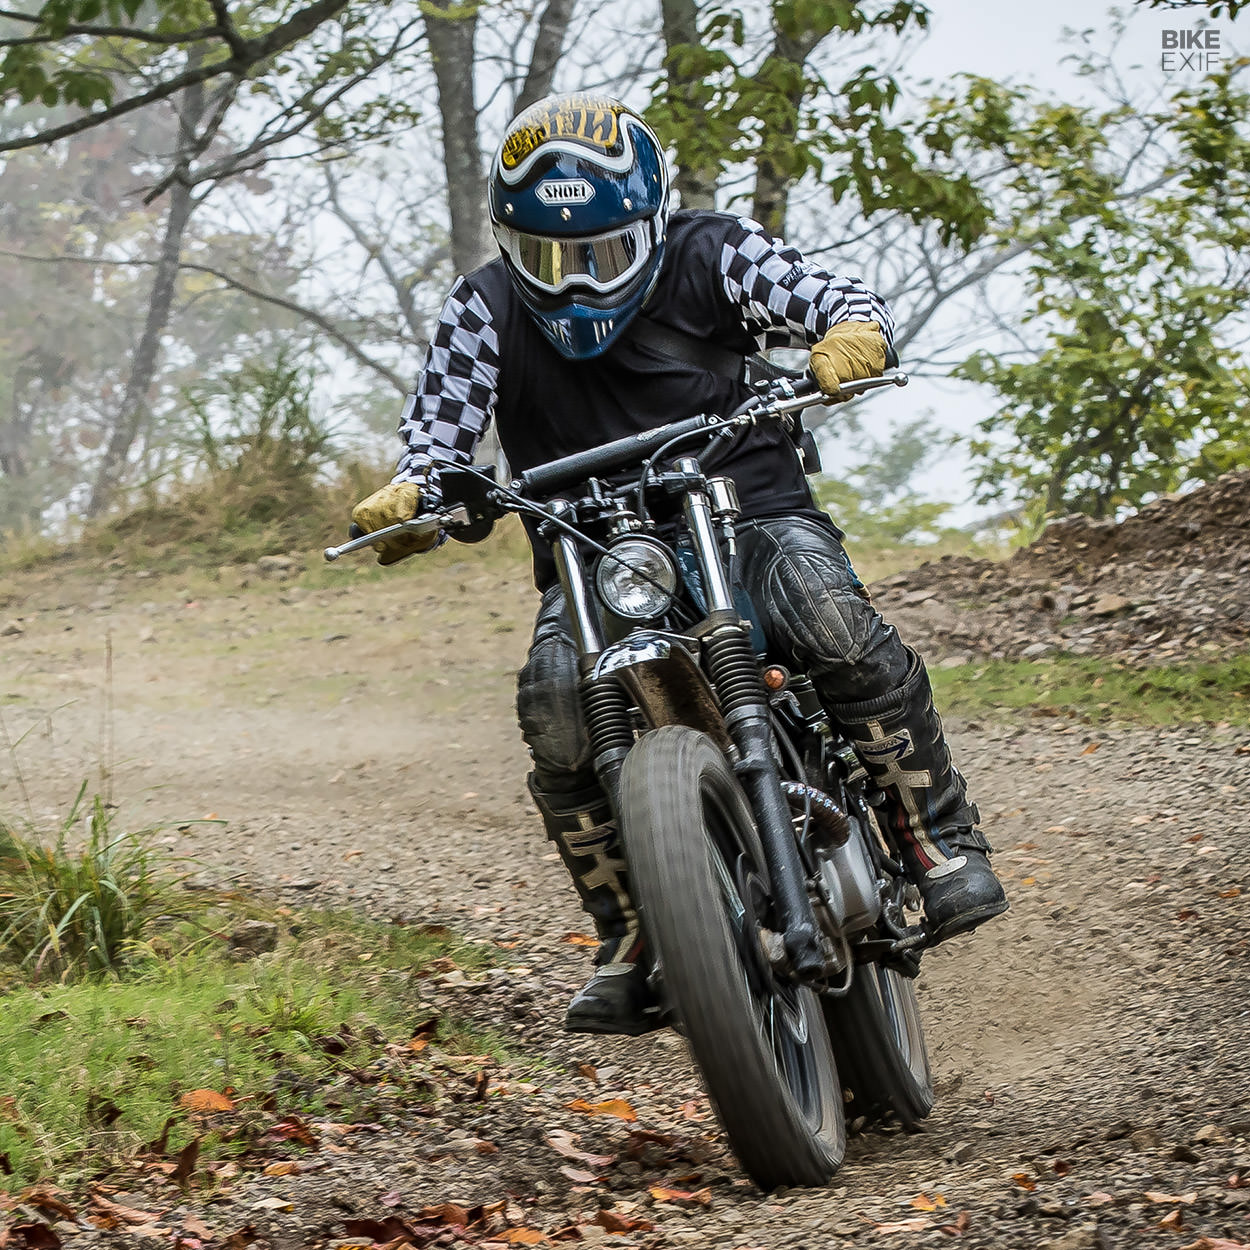 Suzuki TU250 scrambler by Heiwa Motorcycle